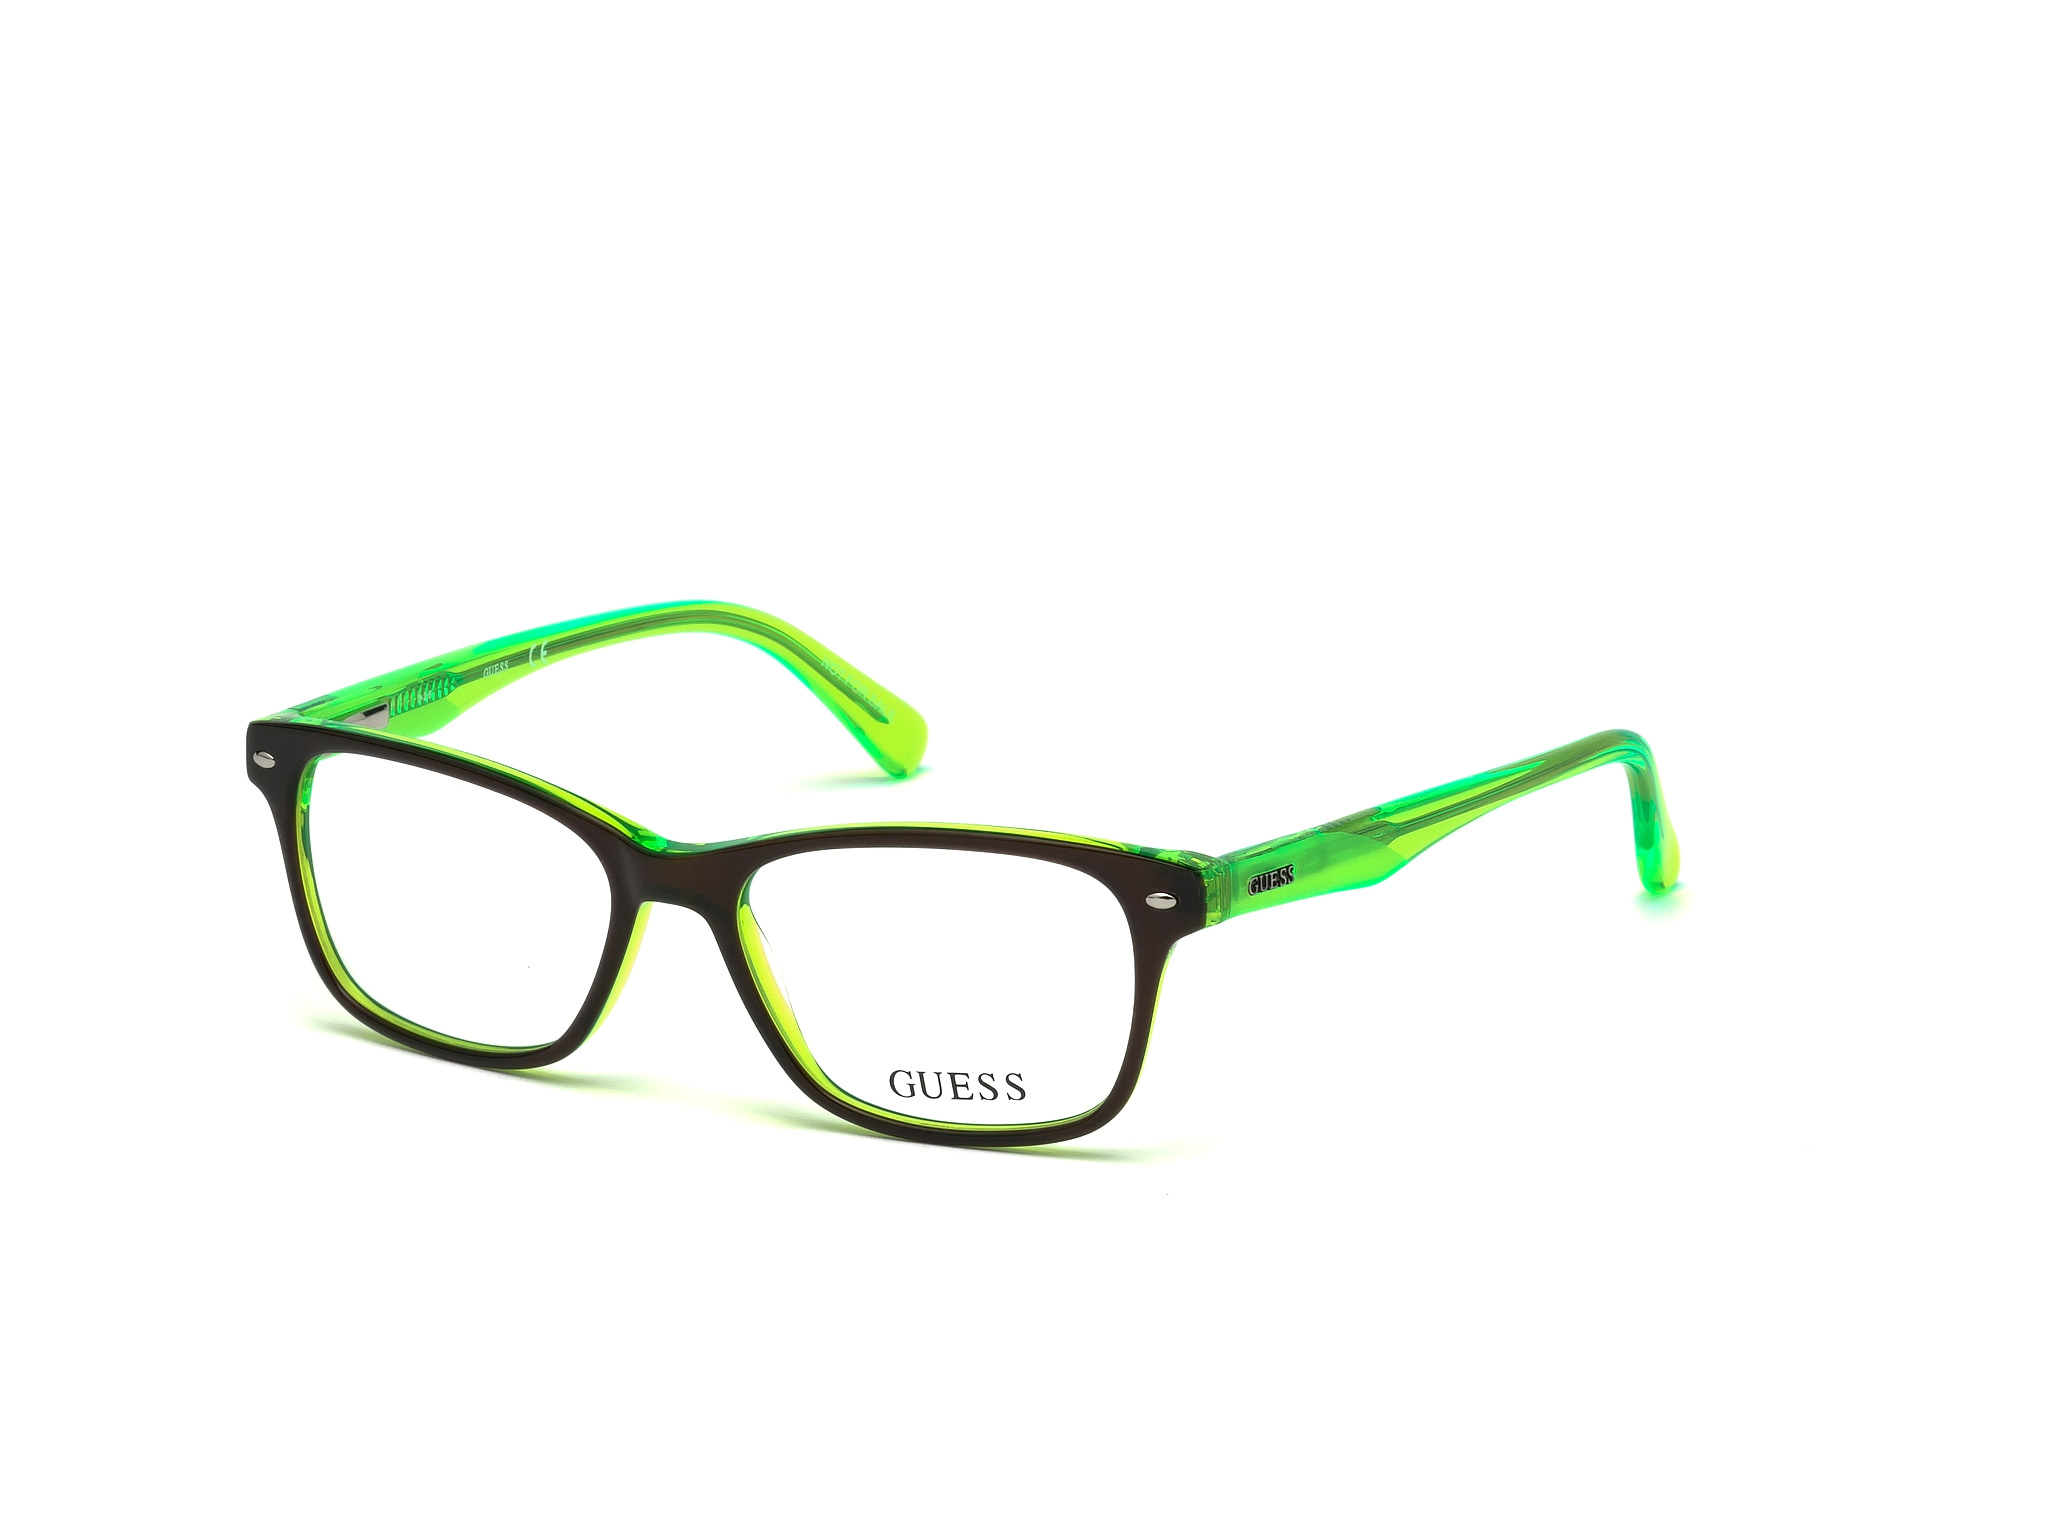 da6f0ef644 Guess Kids GU9172 Eyeglasses Light Green 095 Guess GU9172 095 - Optiwow